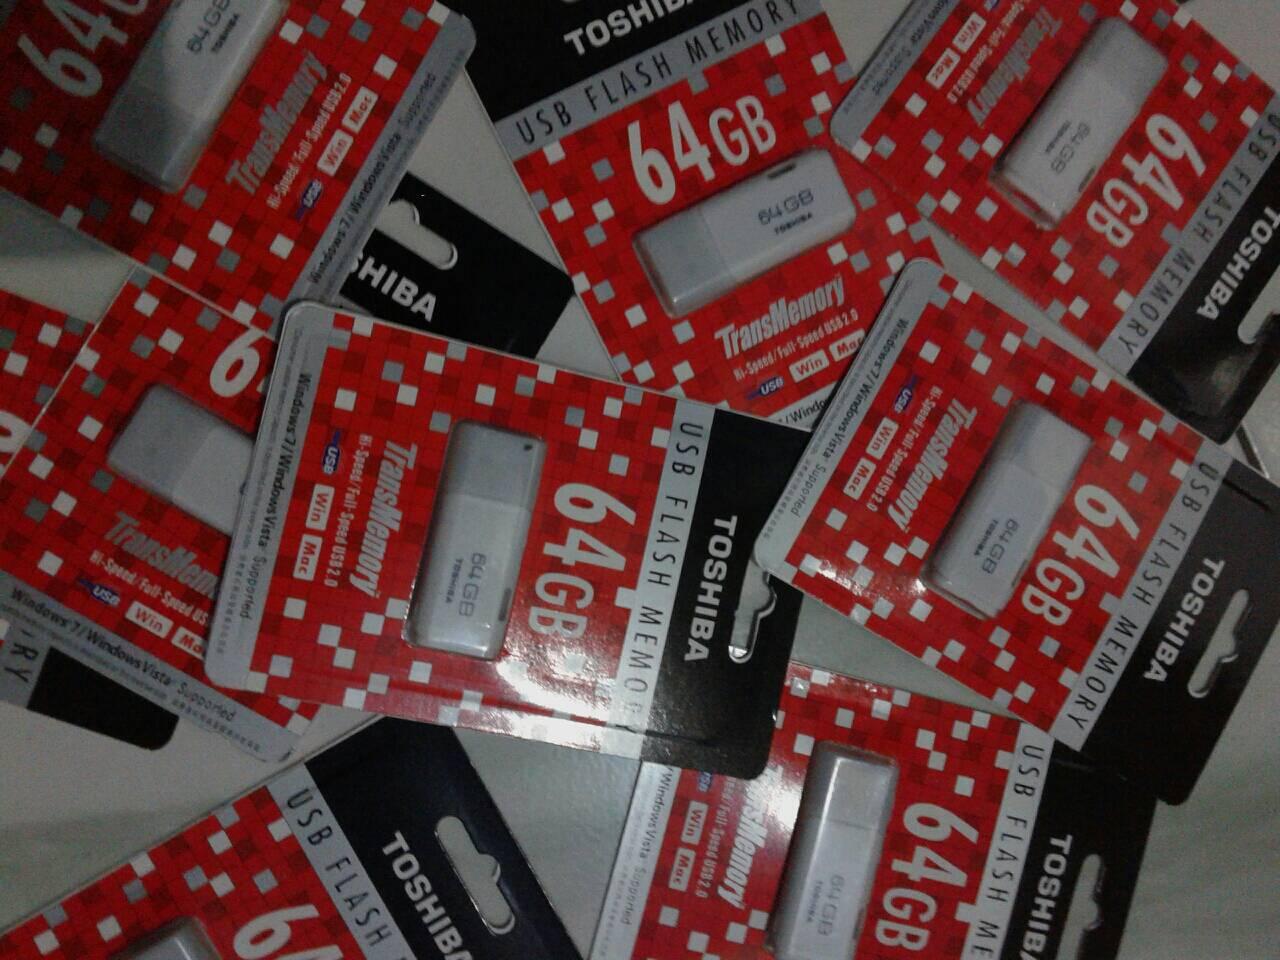 Jual Flashdisk Toshiba 64gb Murah Garansi Ory Flash Disk Tosiba 64 Gb Ori Toko 1353 Tokopedia